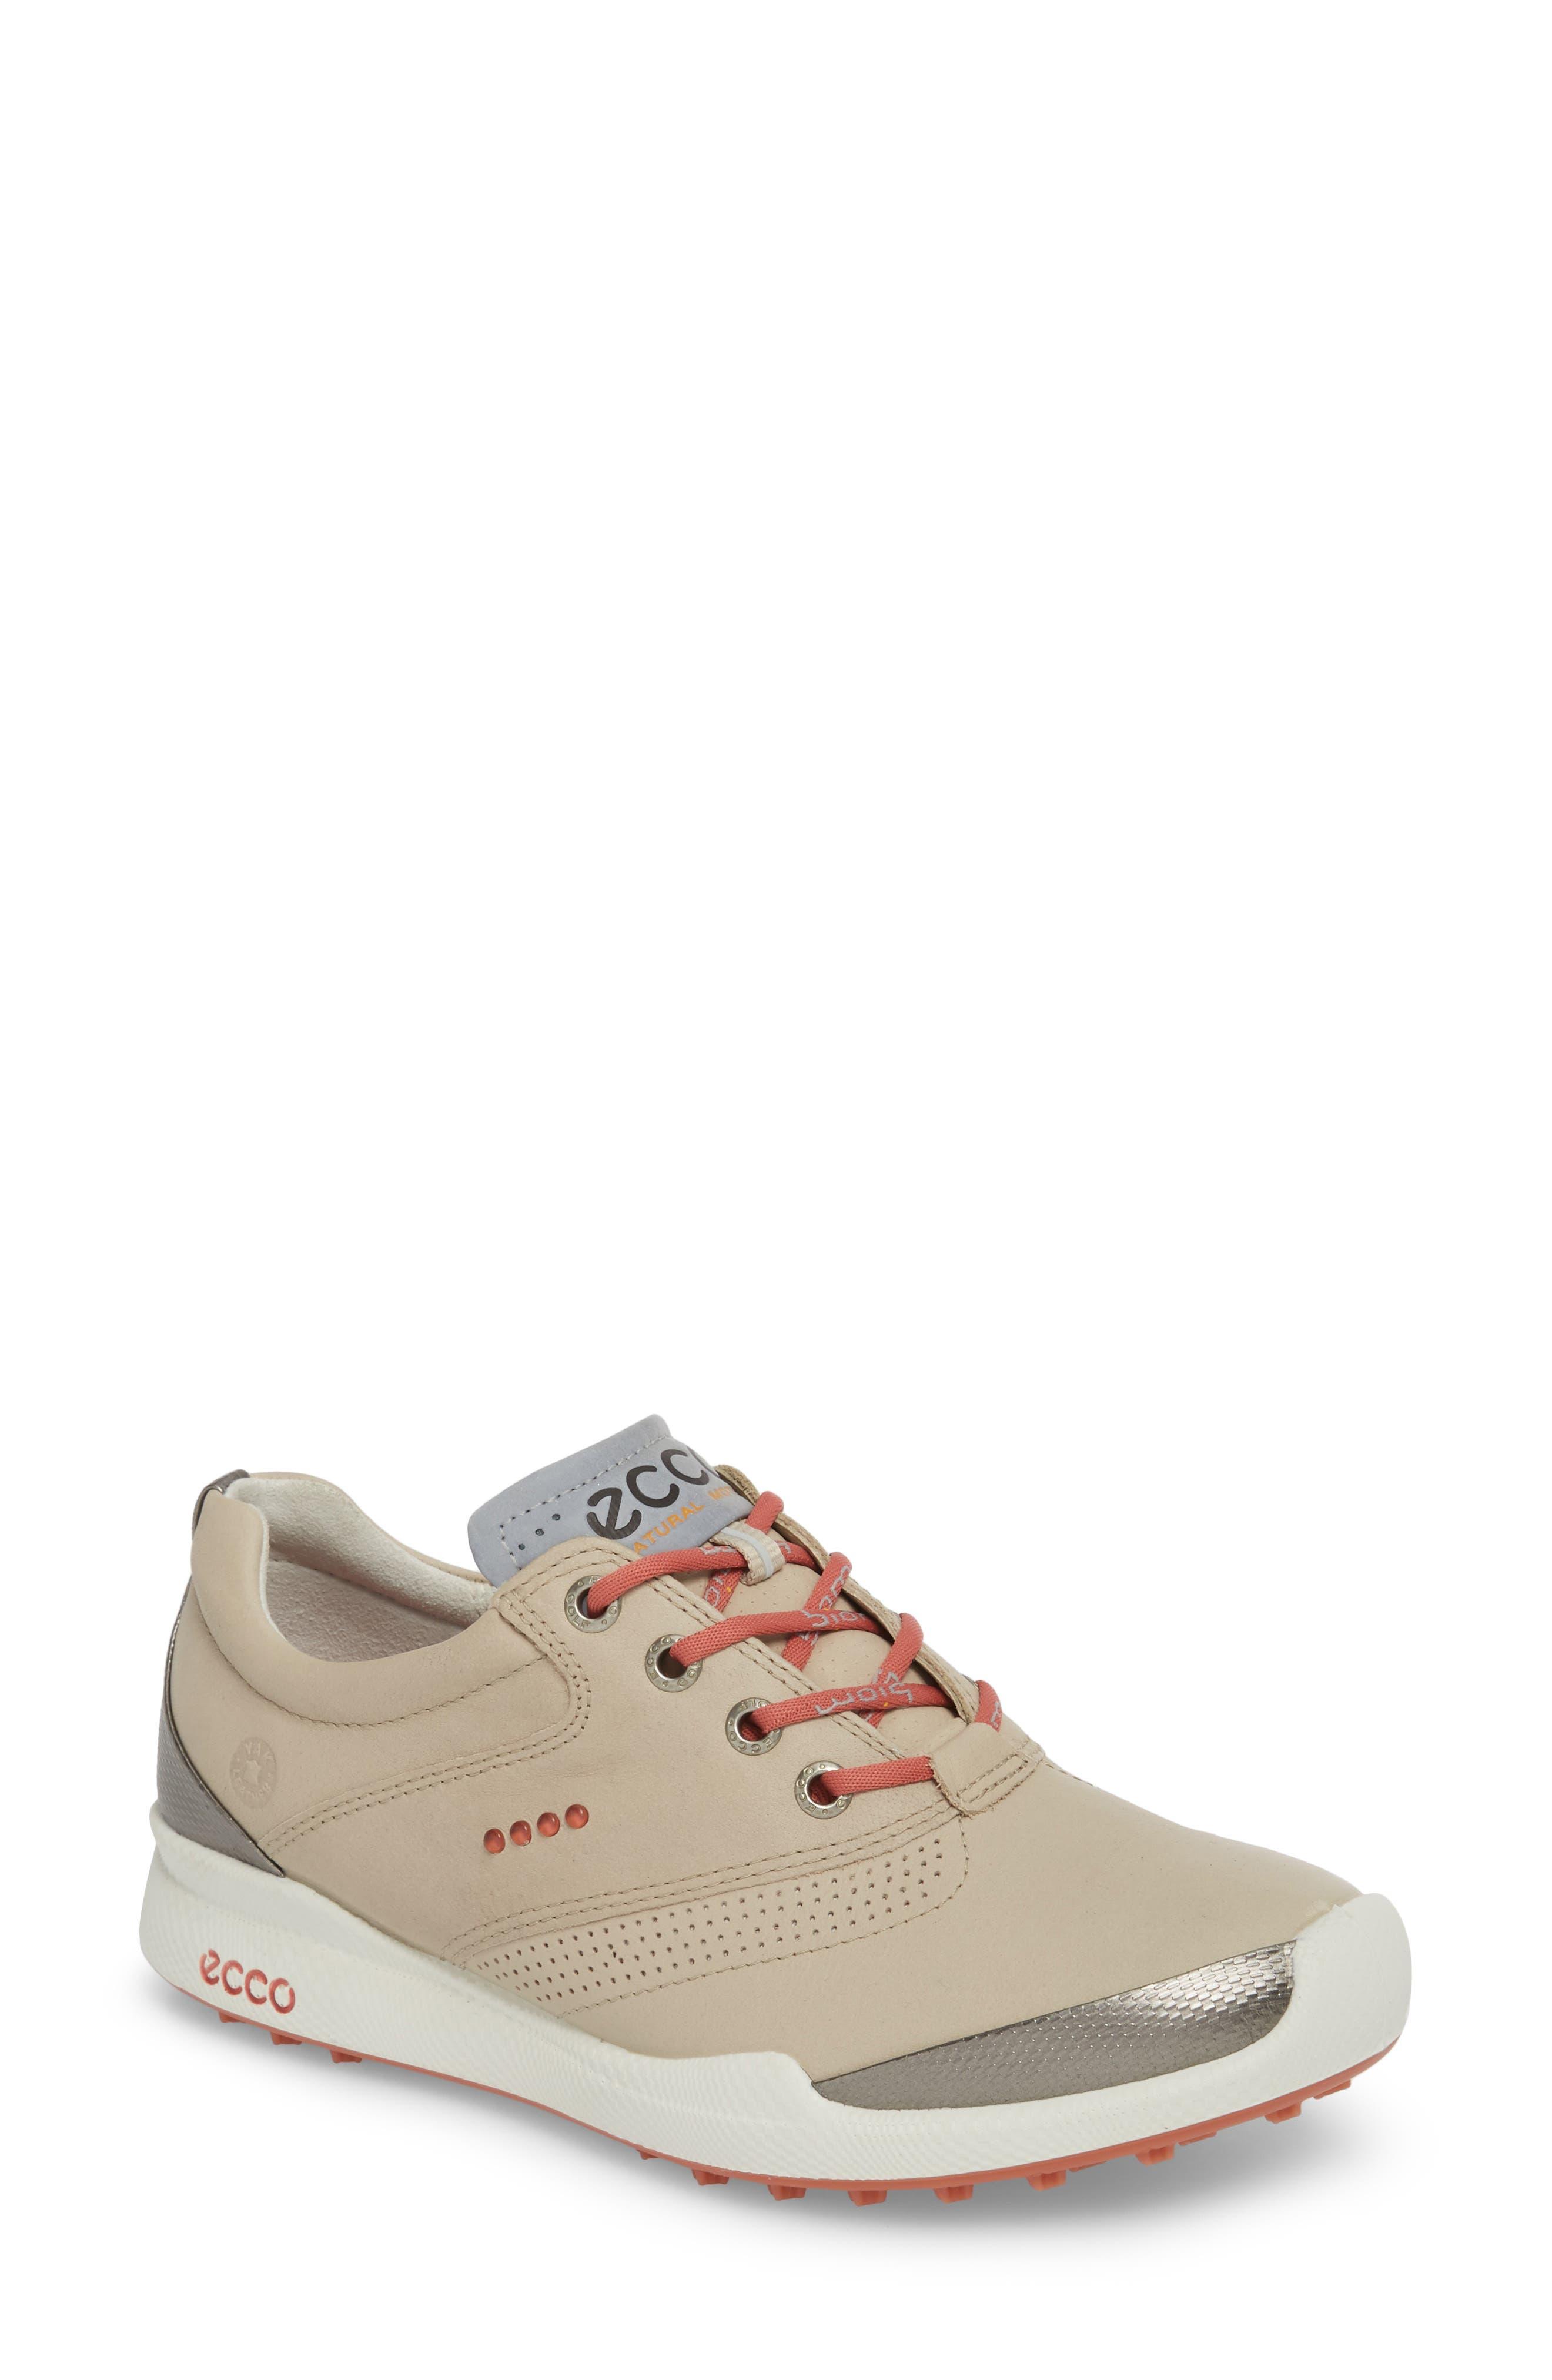 ECCO Biom Hybrid Golf Shoe (Women)